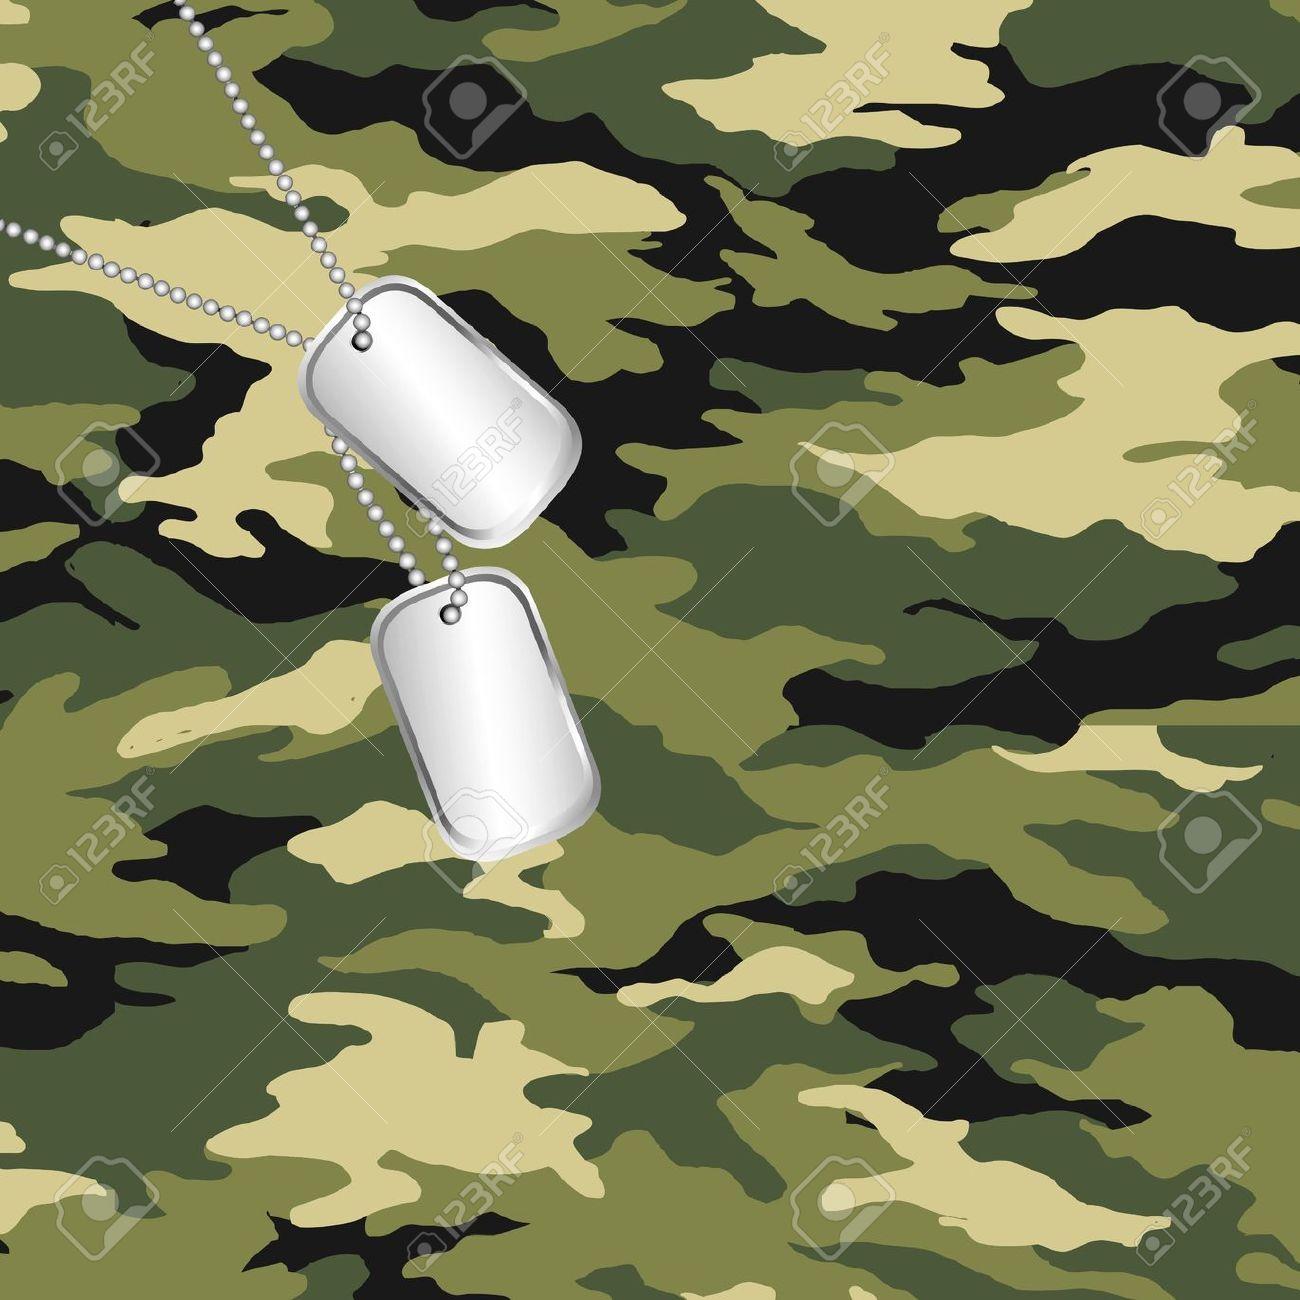 Camo clipart wallpaper For CGF Army Camo Live